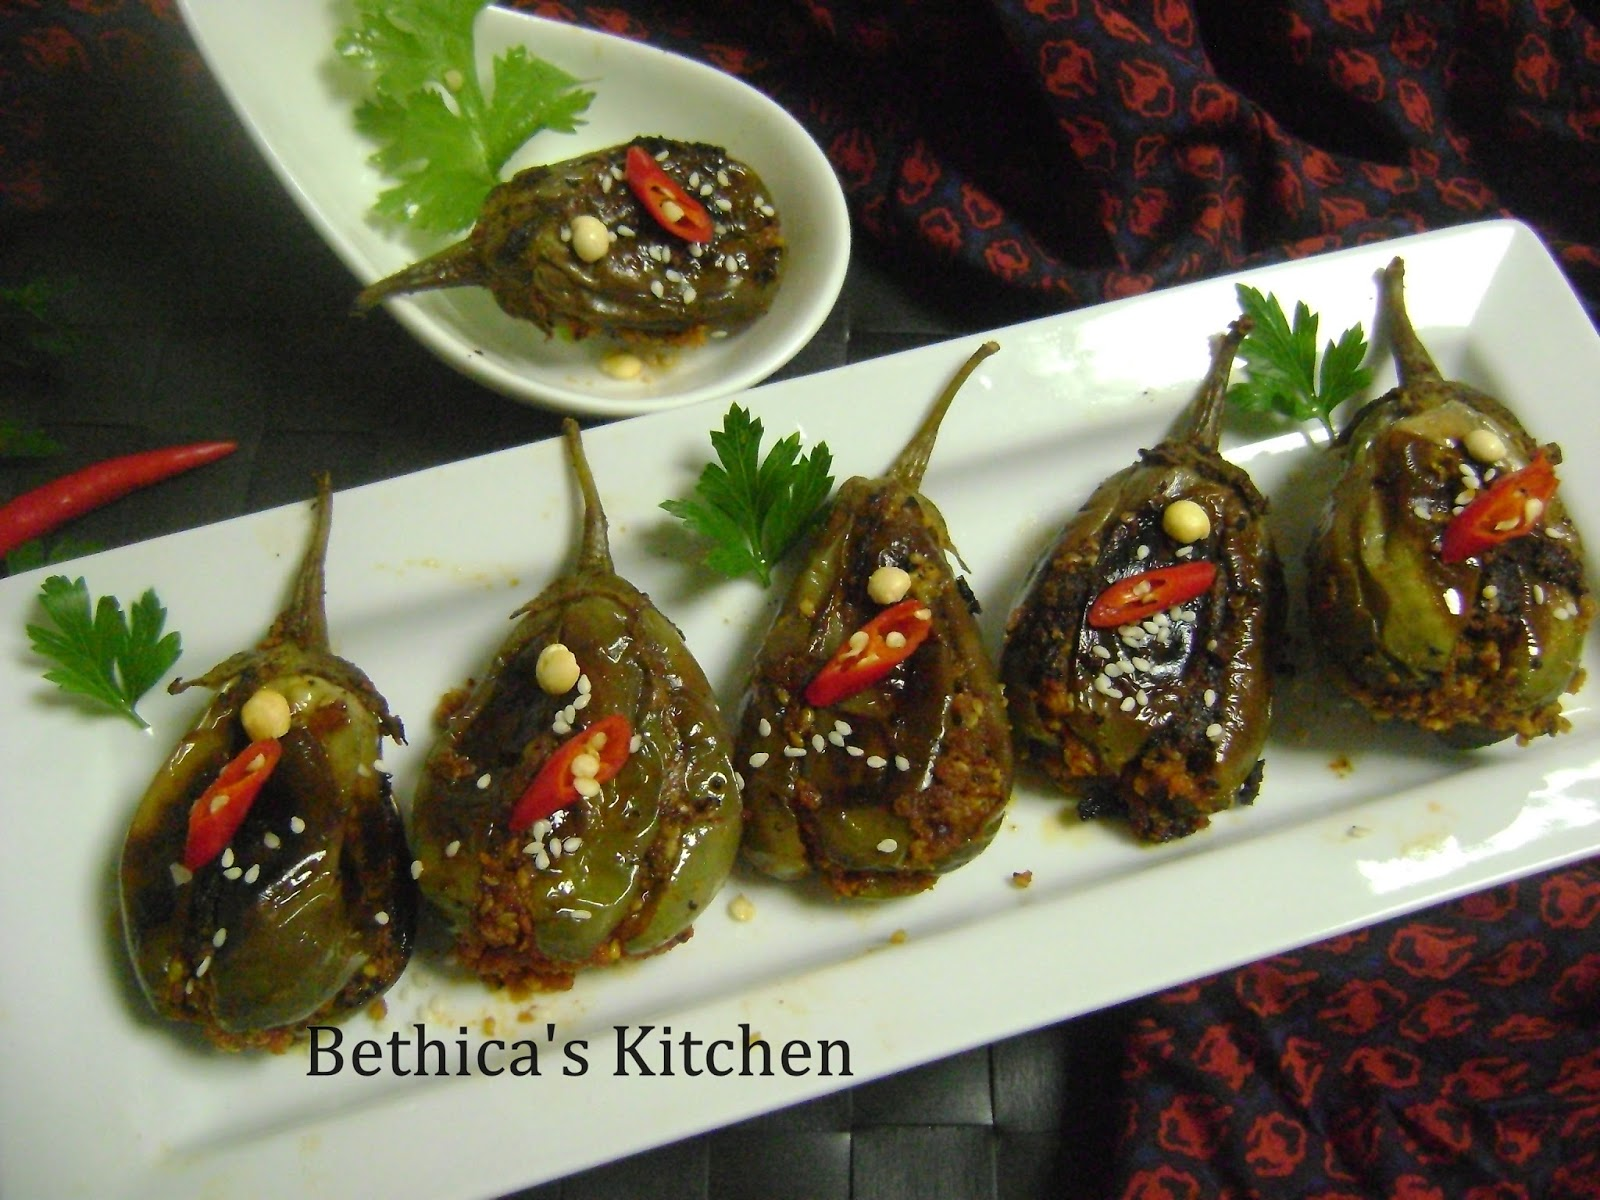 Bethicas kitchen flavours raw mango stuffed baby eggplants 8 10 small eggplants forumfinder Images